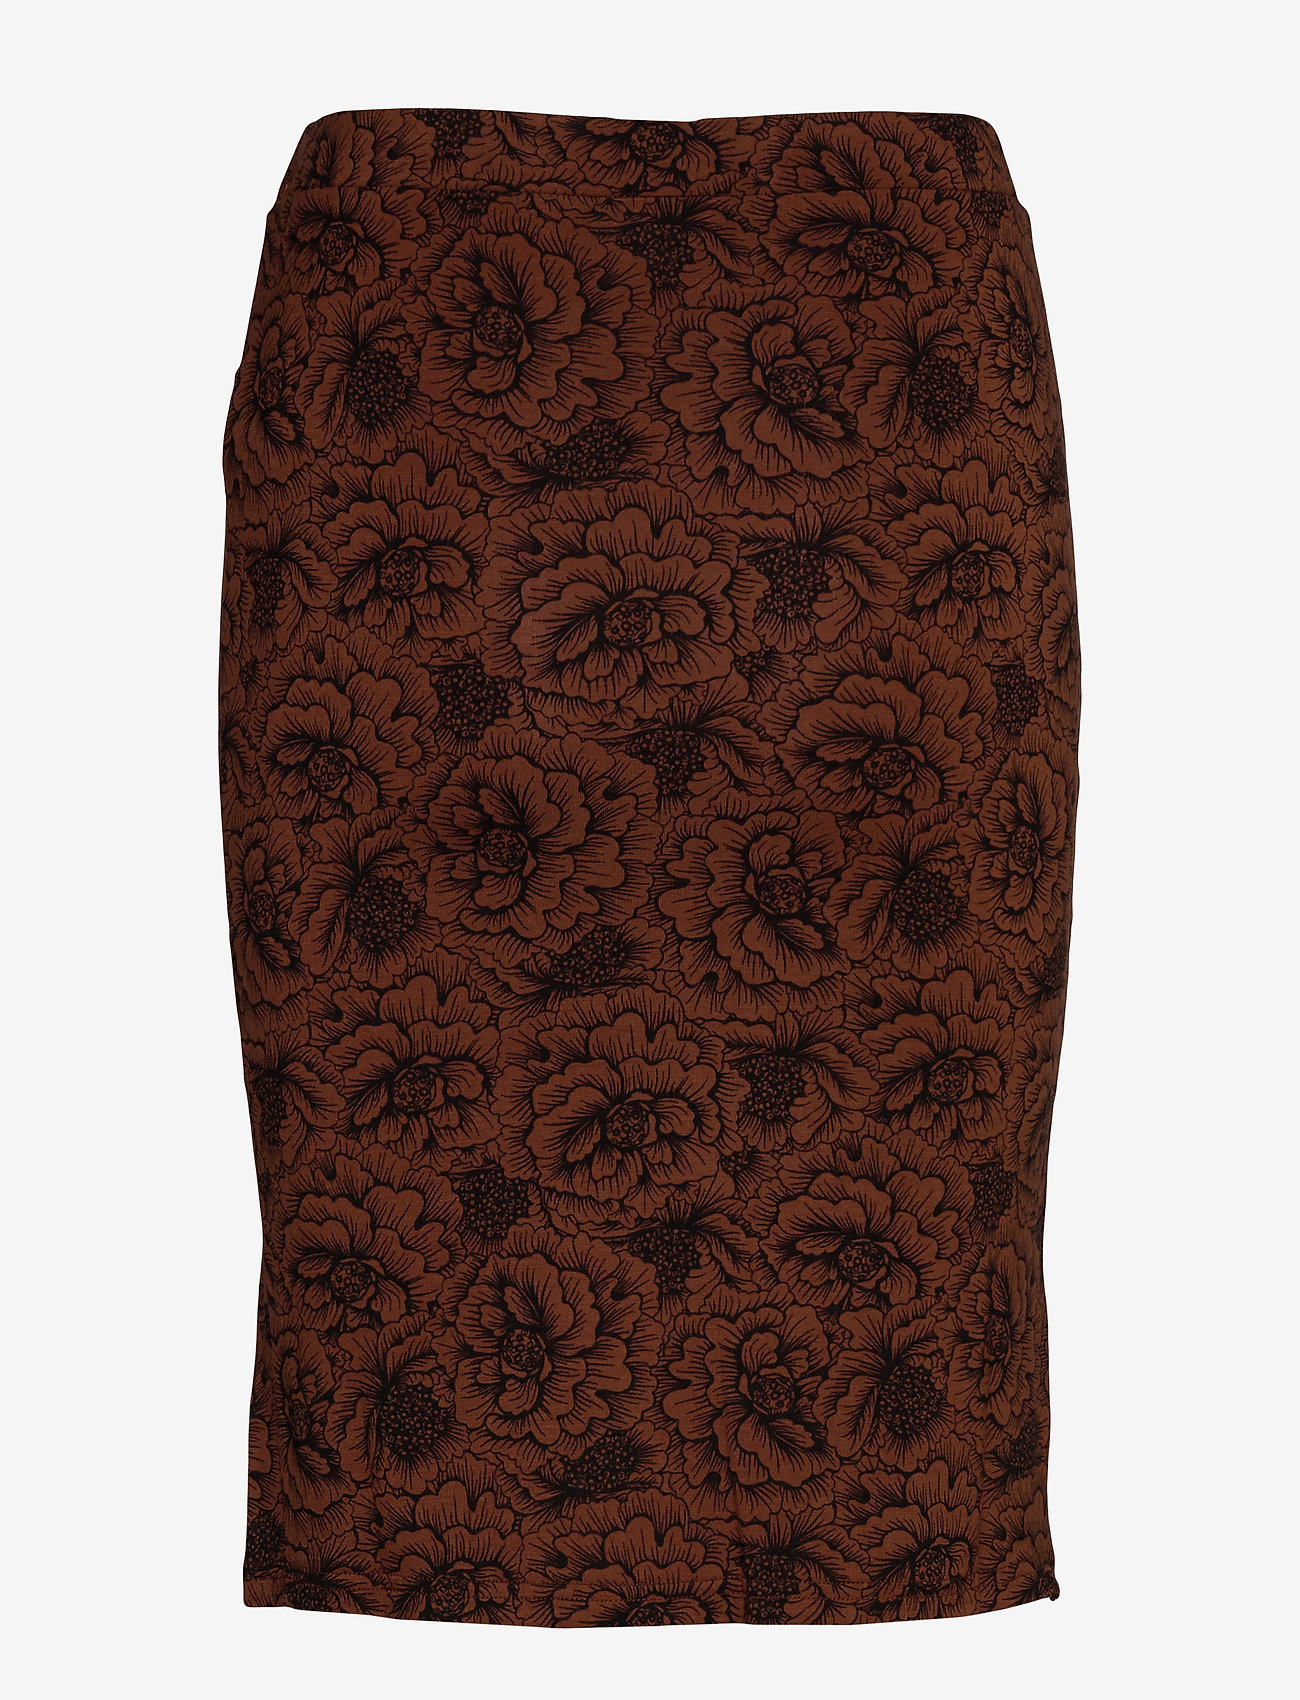 Skirt (Amber Brown Rose Print) - Rosemunde mZsI2i